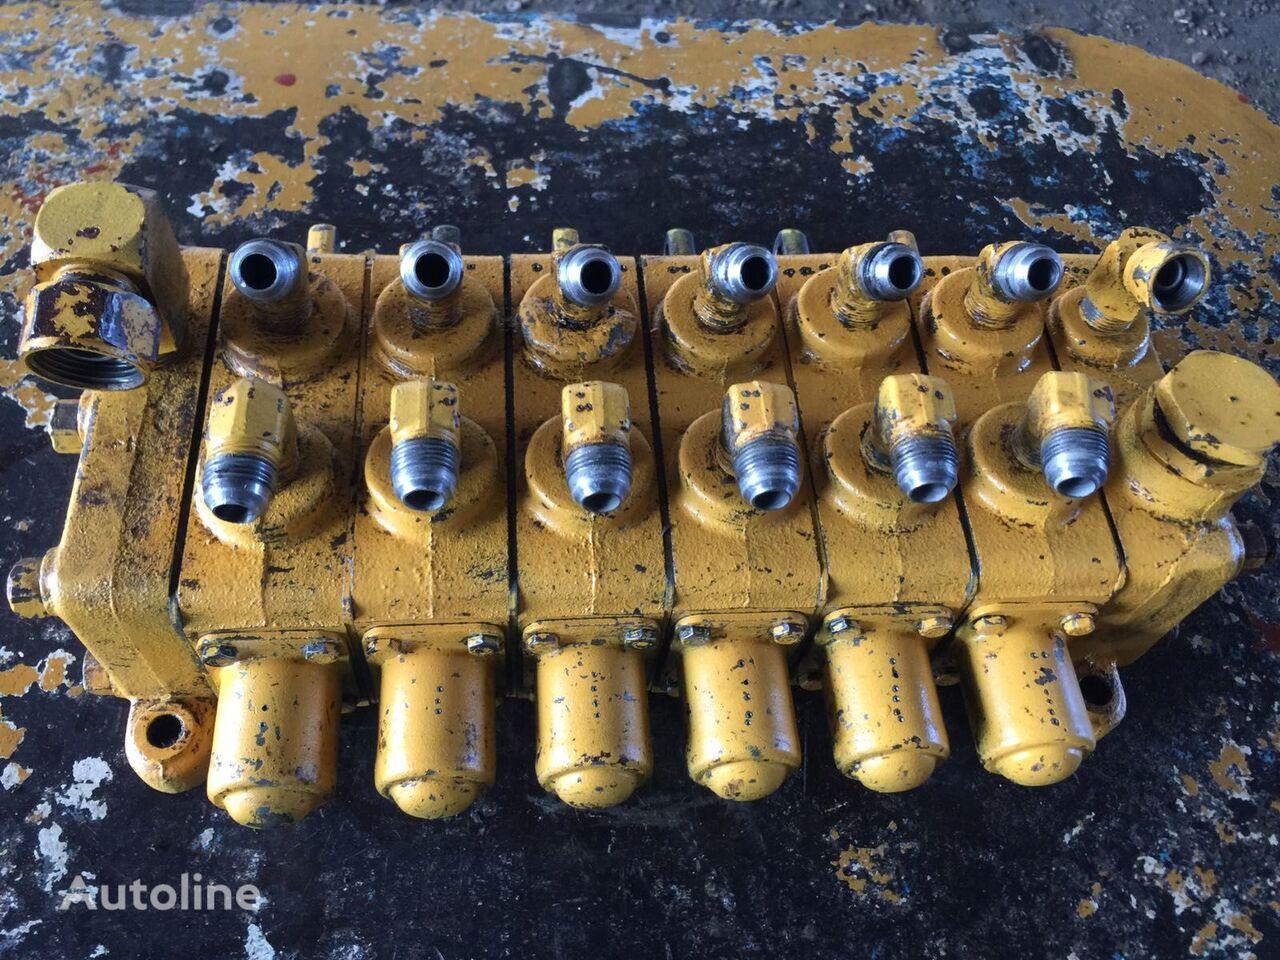 USED CHAMPION D560 D562 D565 D581 D600 D605T D640 D680 D671 D686 hydraulic distributor for CHAMPION D-560 / D-562 / D-565 / D-581 / D-600 / D-605T / D-640 / D-680 / D-671 / D-686 grader